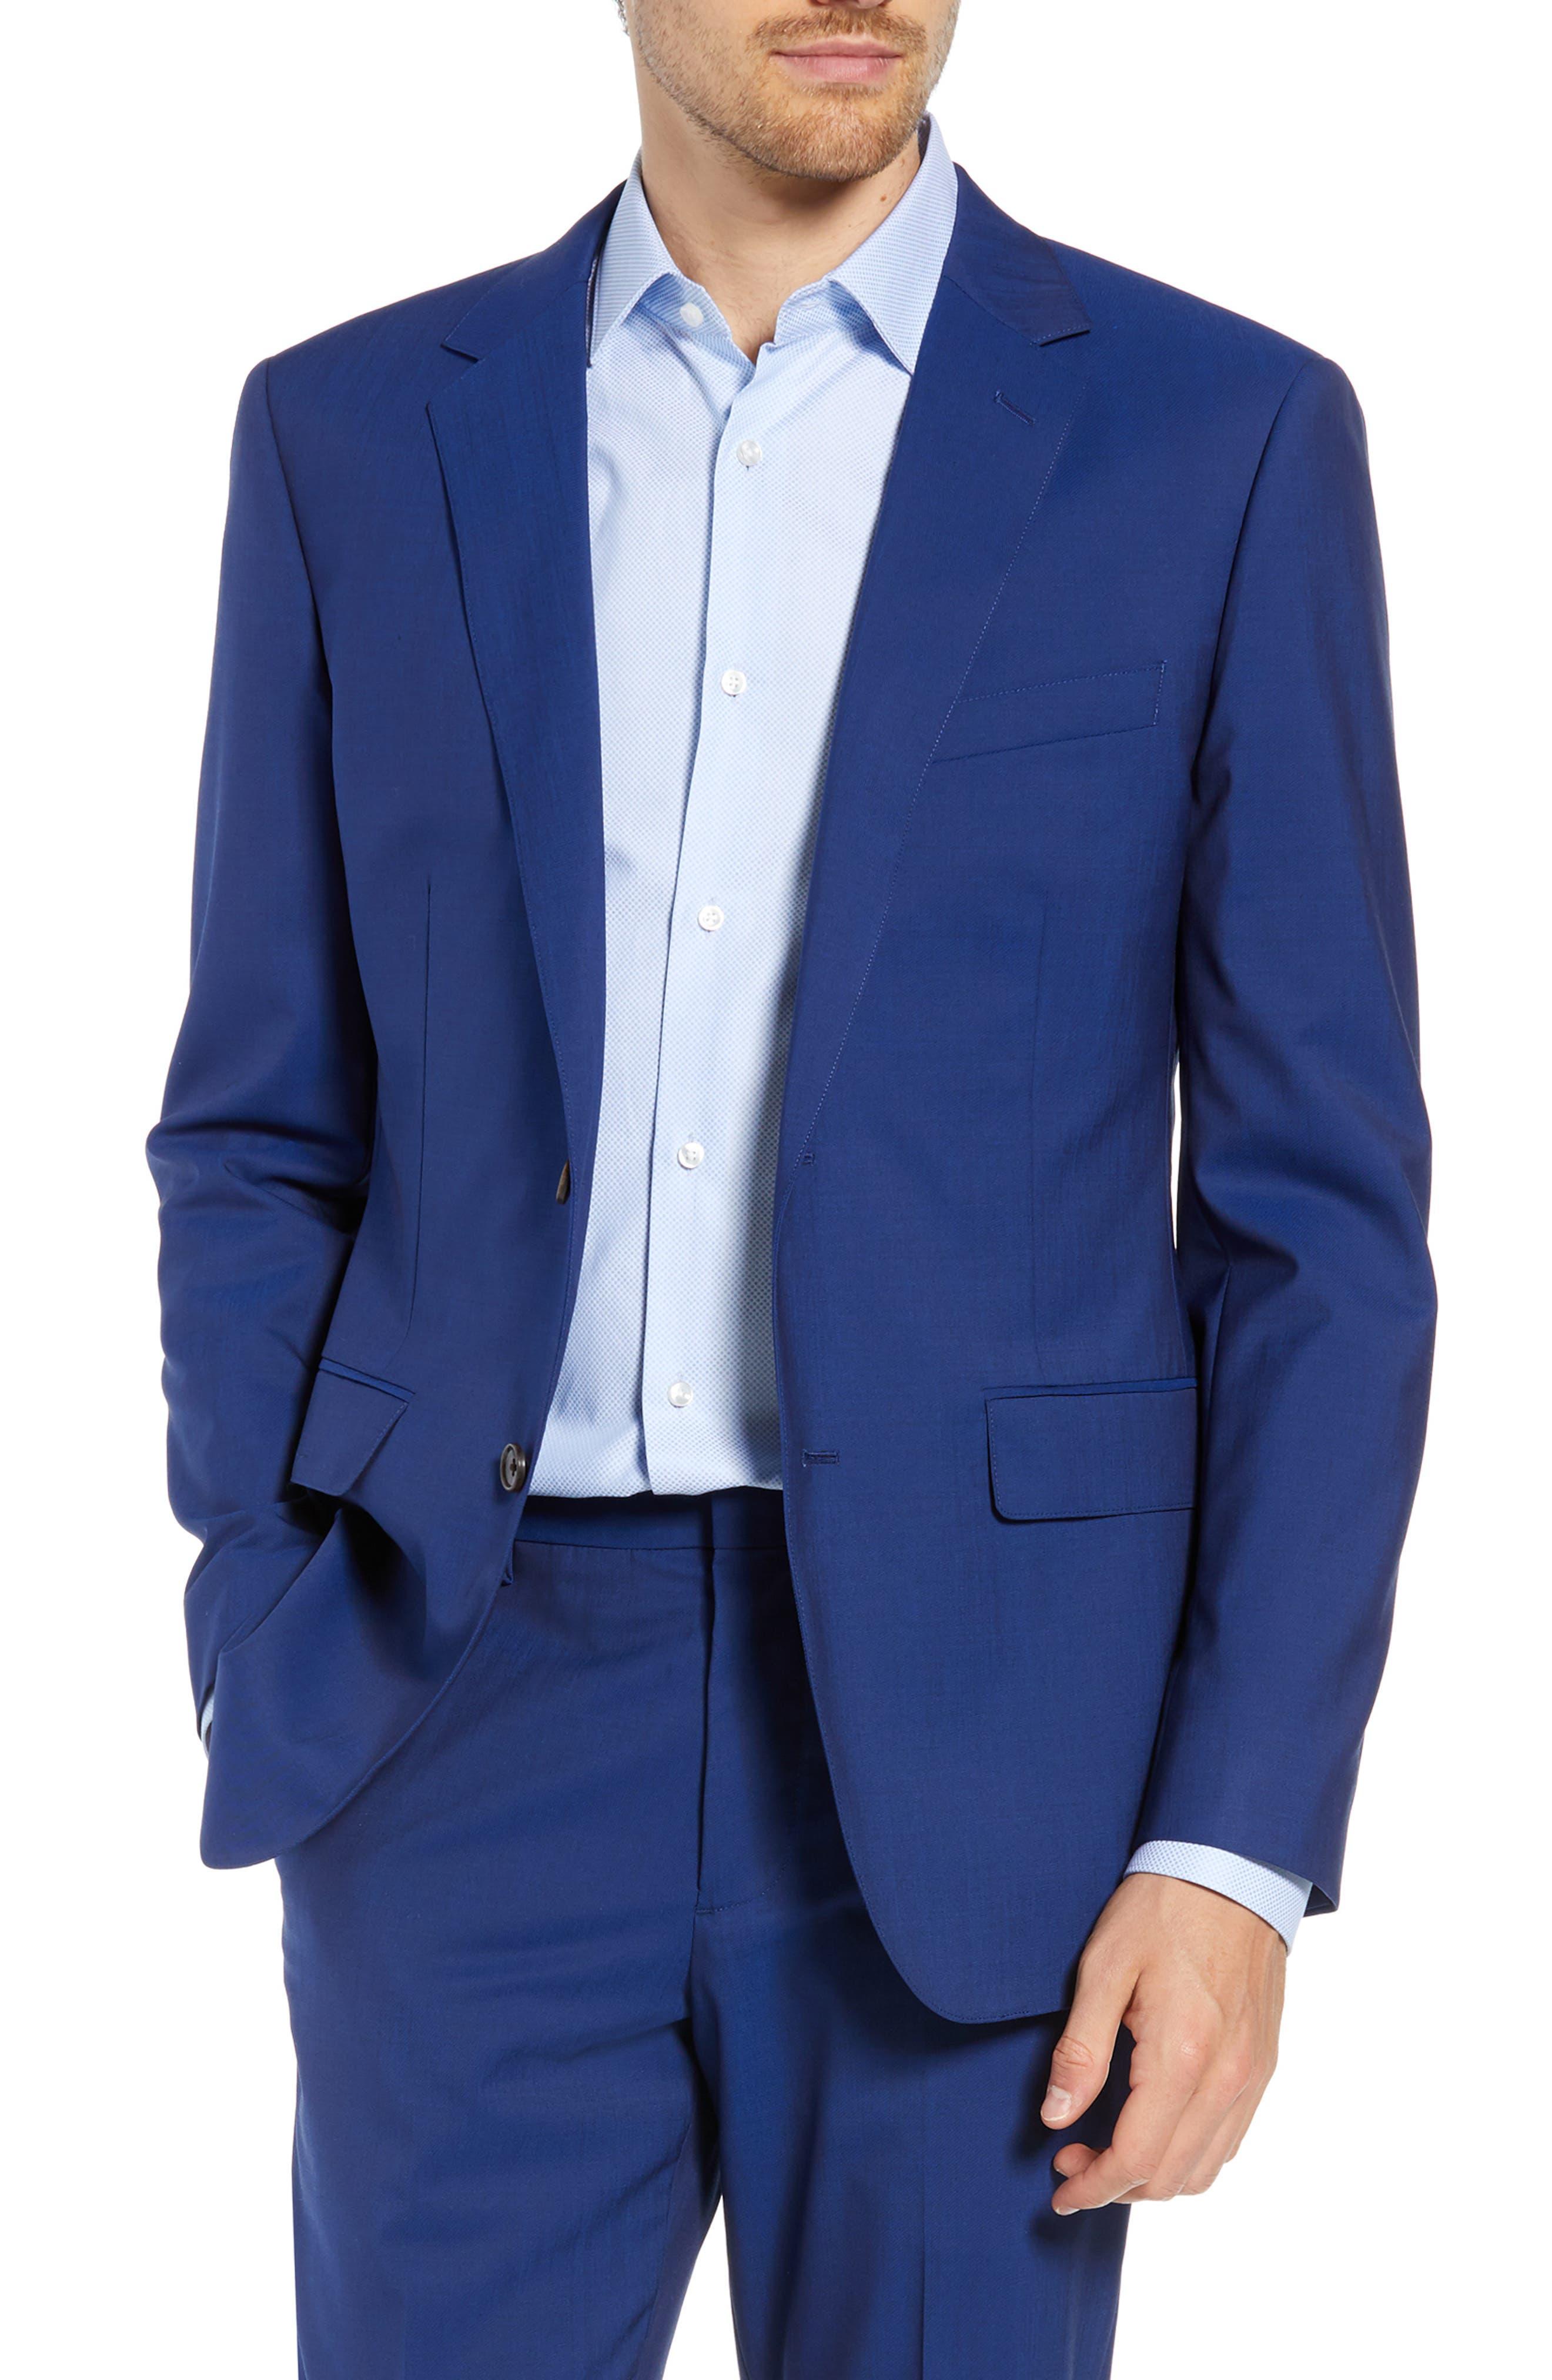 Jetsetter Slim Fit Stretch Wool Blazer,                         Main,                         color, BRILLIANT NAVY